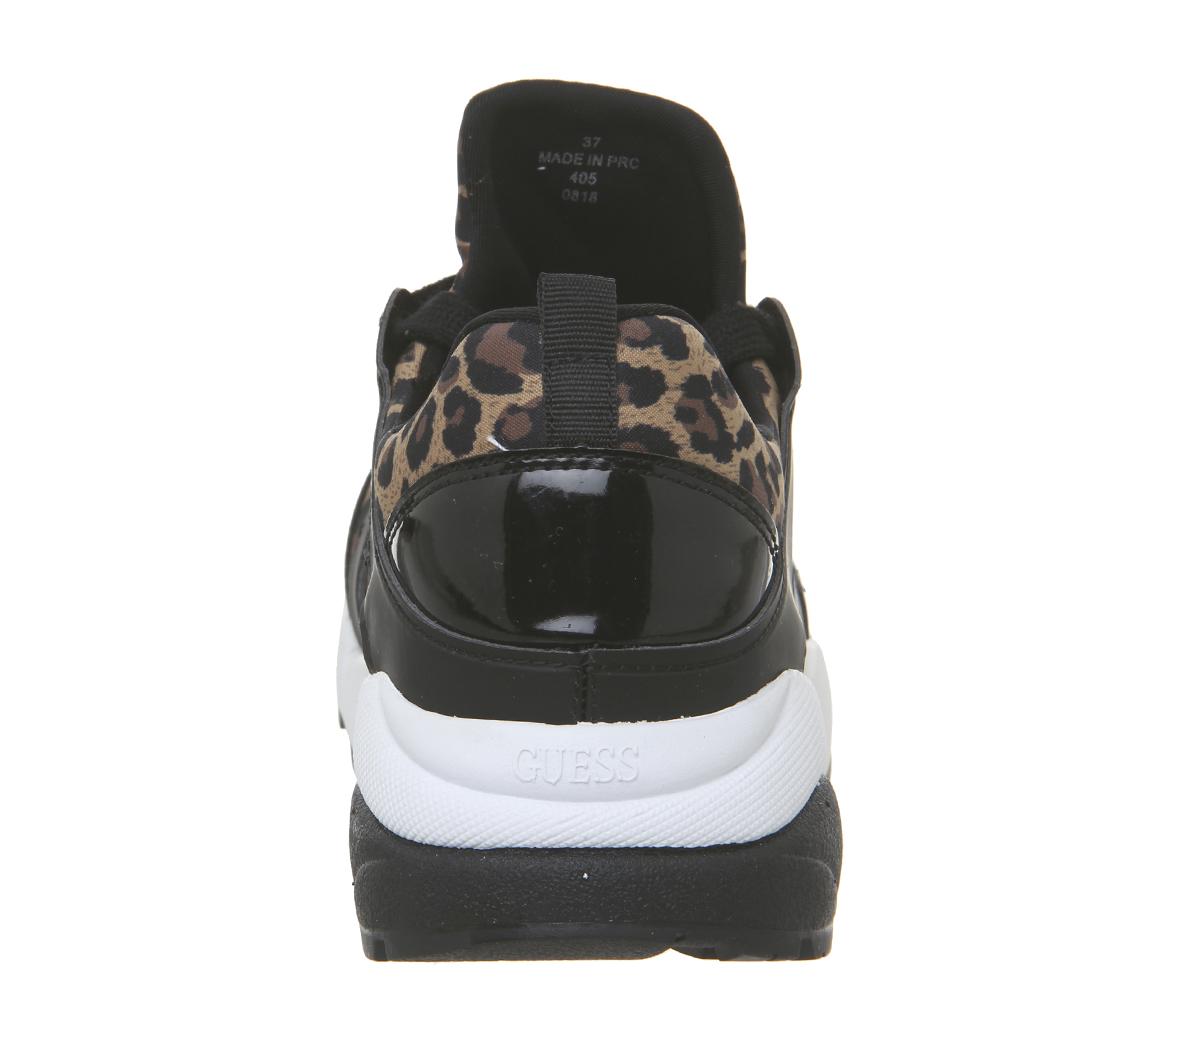 Womens Guess Semi Sneakers Leopard Flats